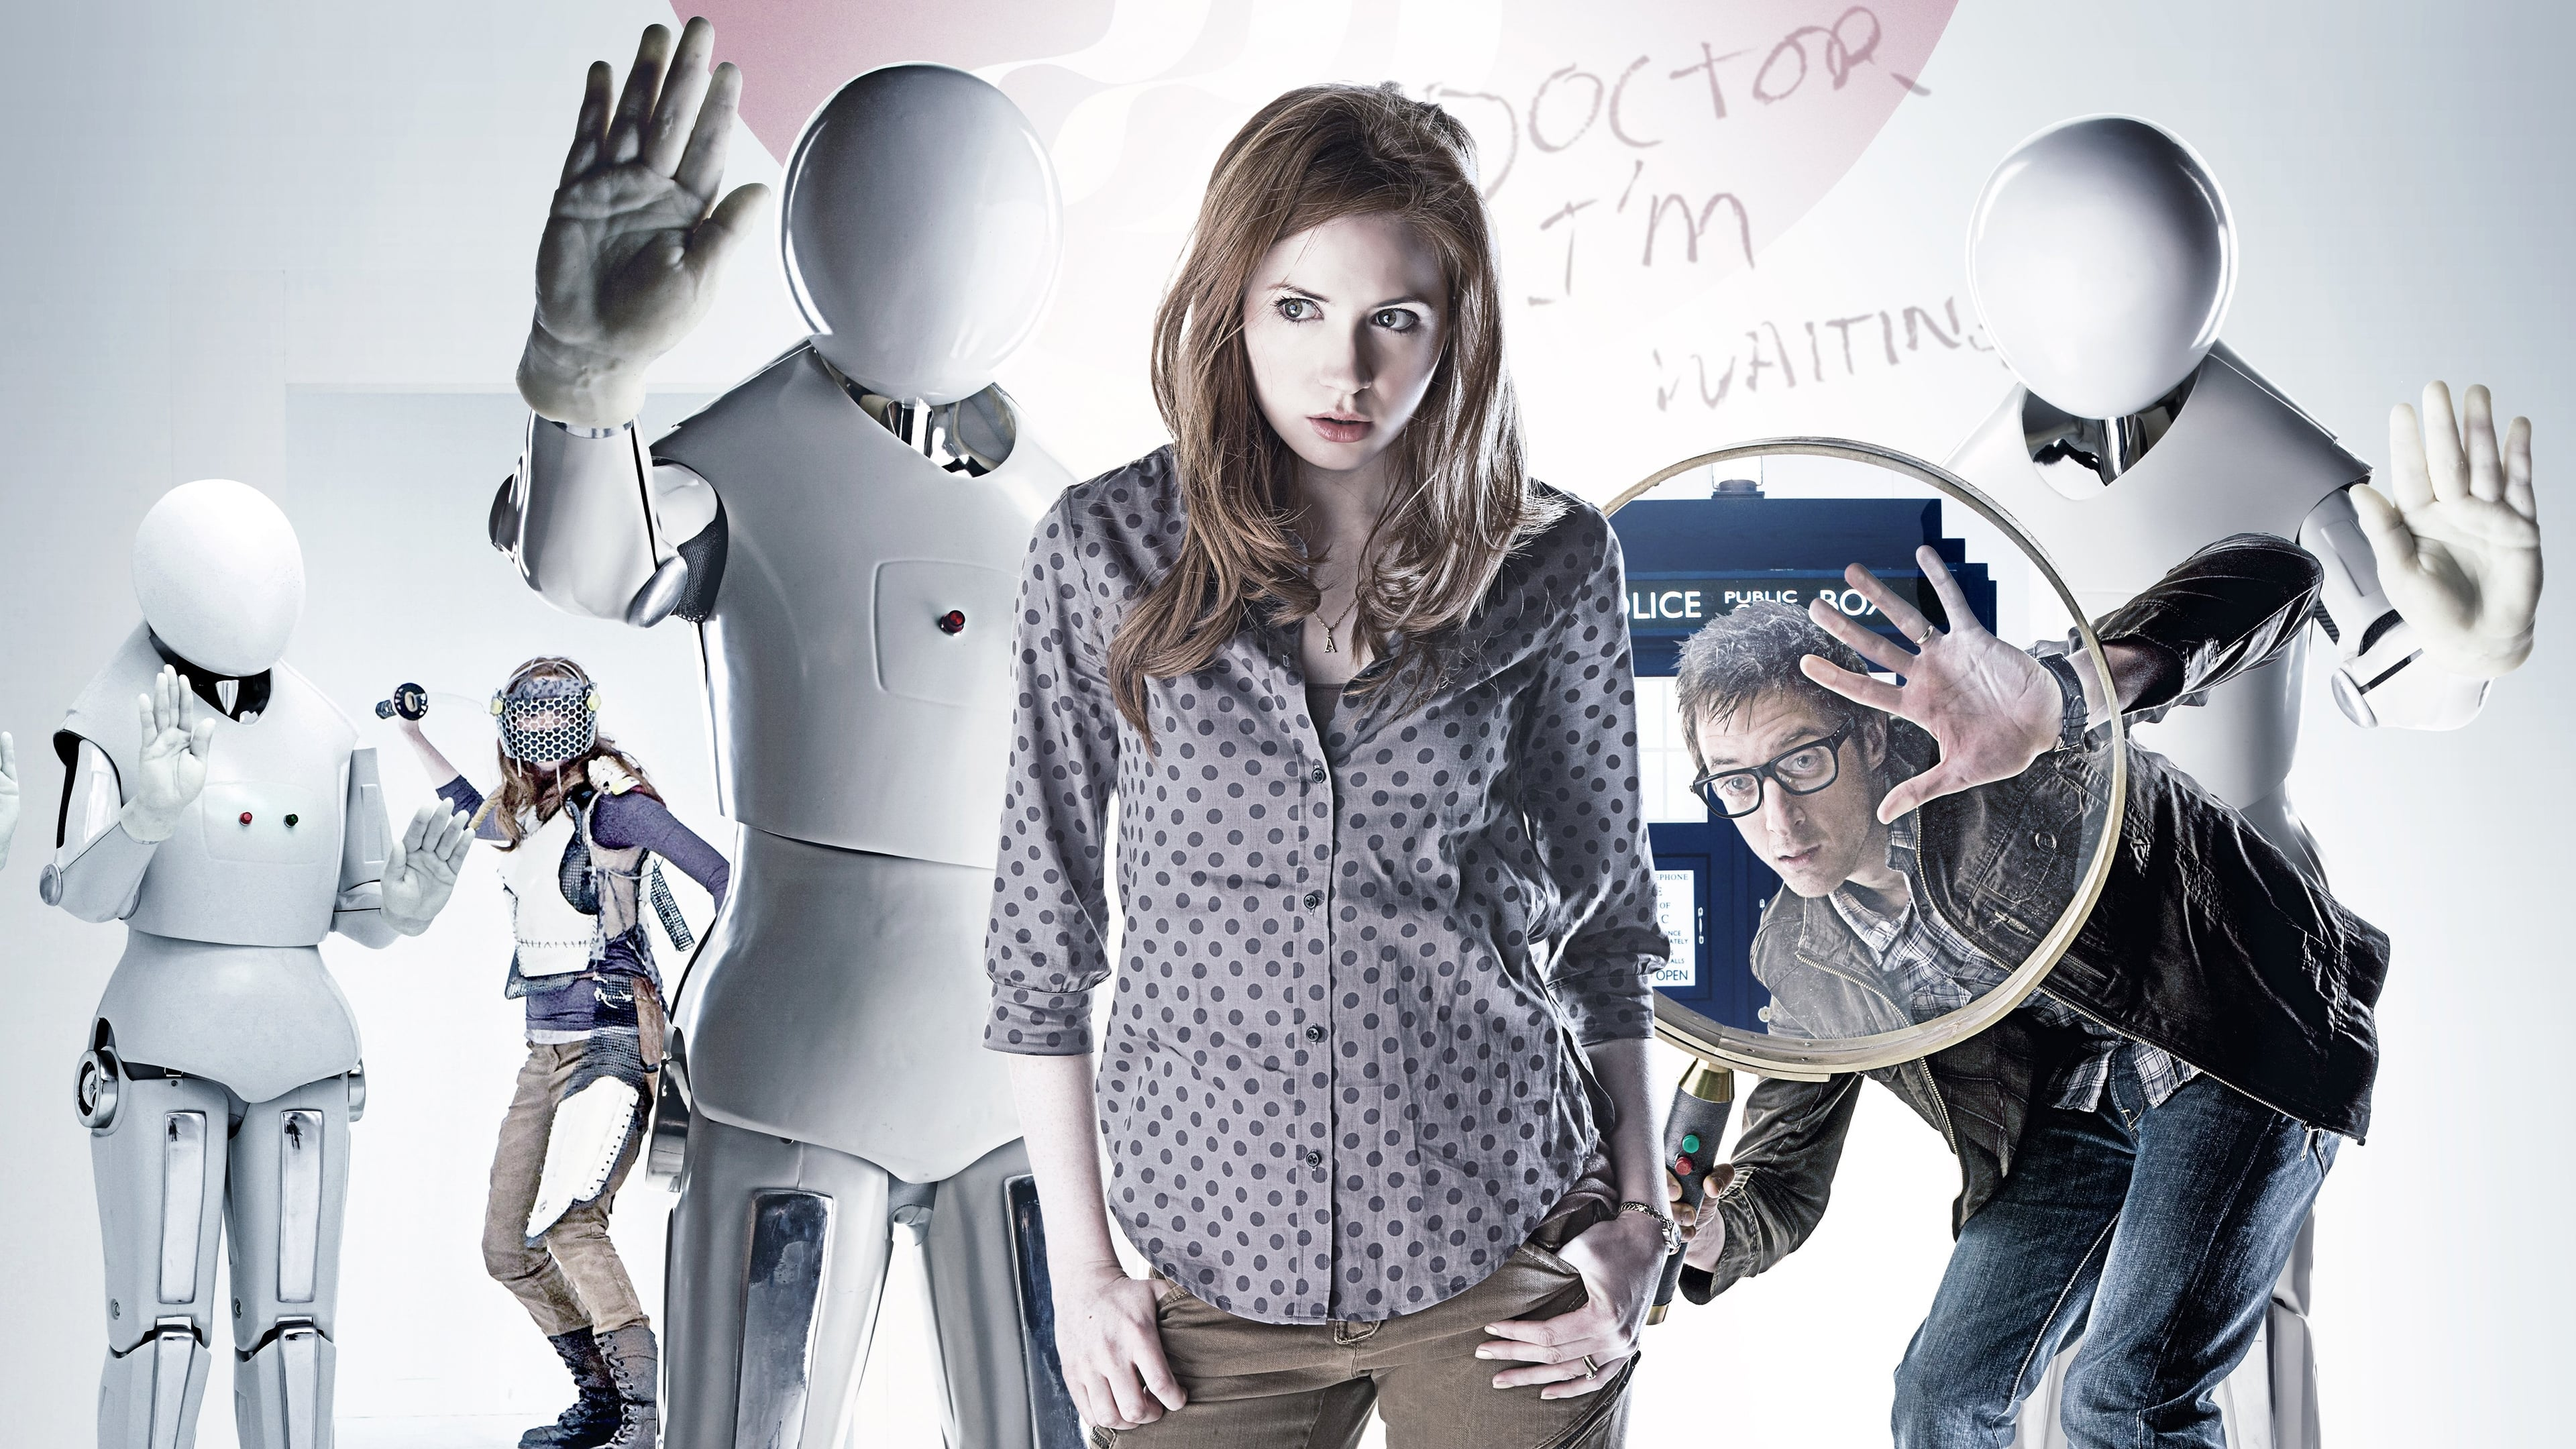 Doctor Who Season 6 :Episode 10  The Girl Who Waited